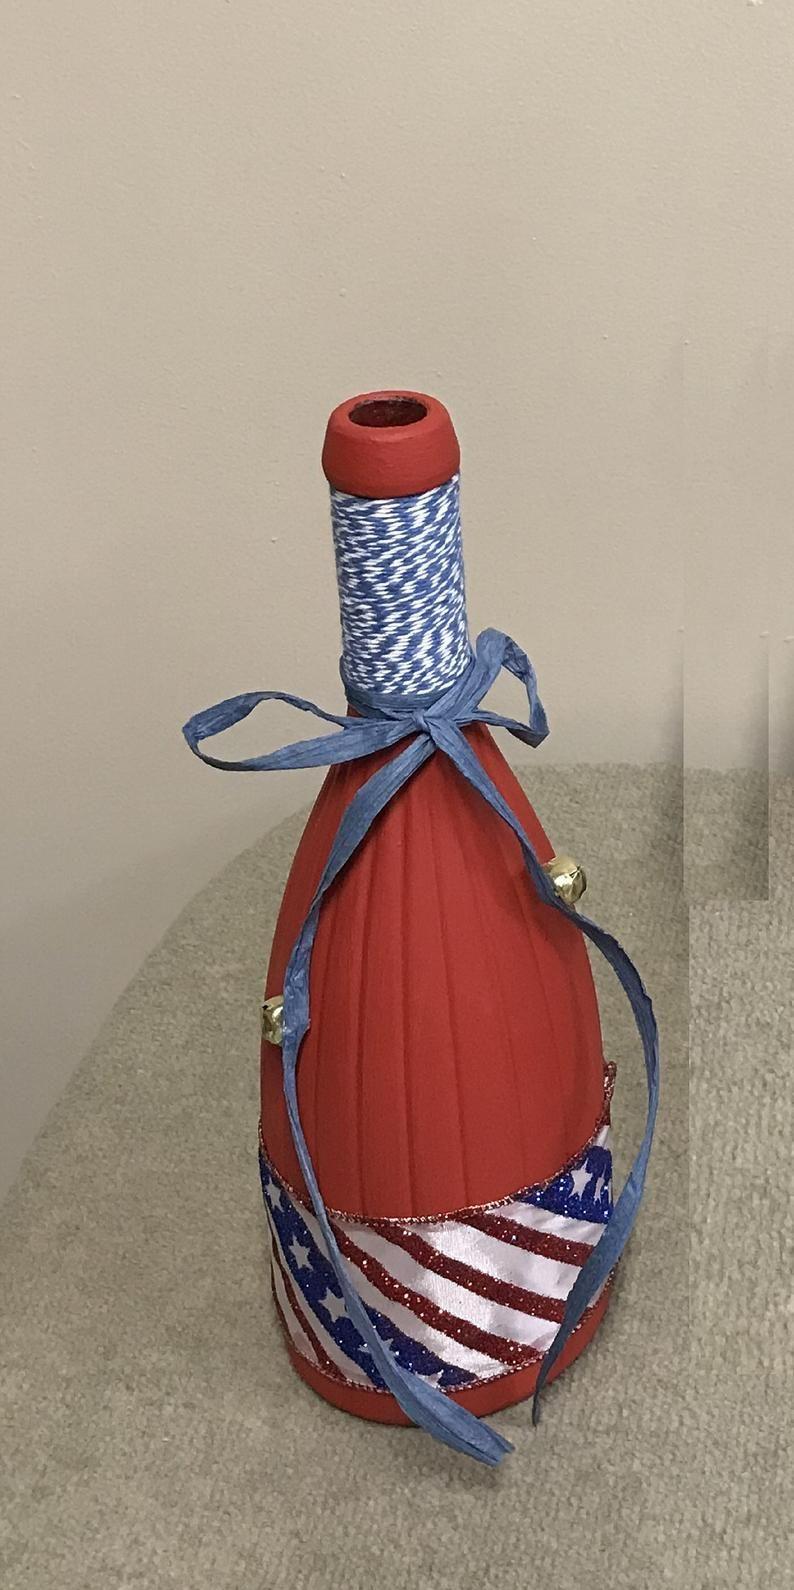 Pin By Nancy Sage On Crafts In 2020 Wine Bottle Decor Blue Wine Bottles Bottles Decoration